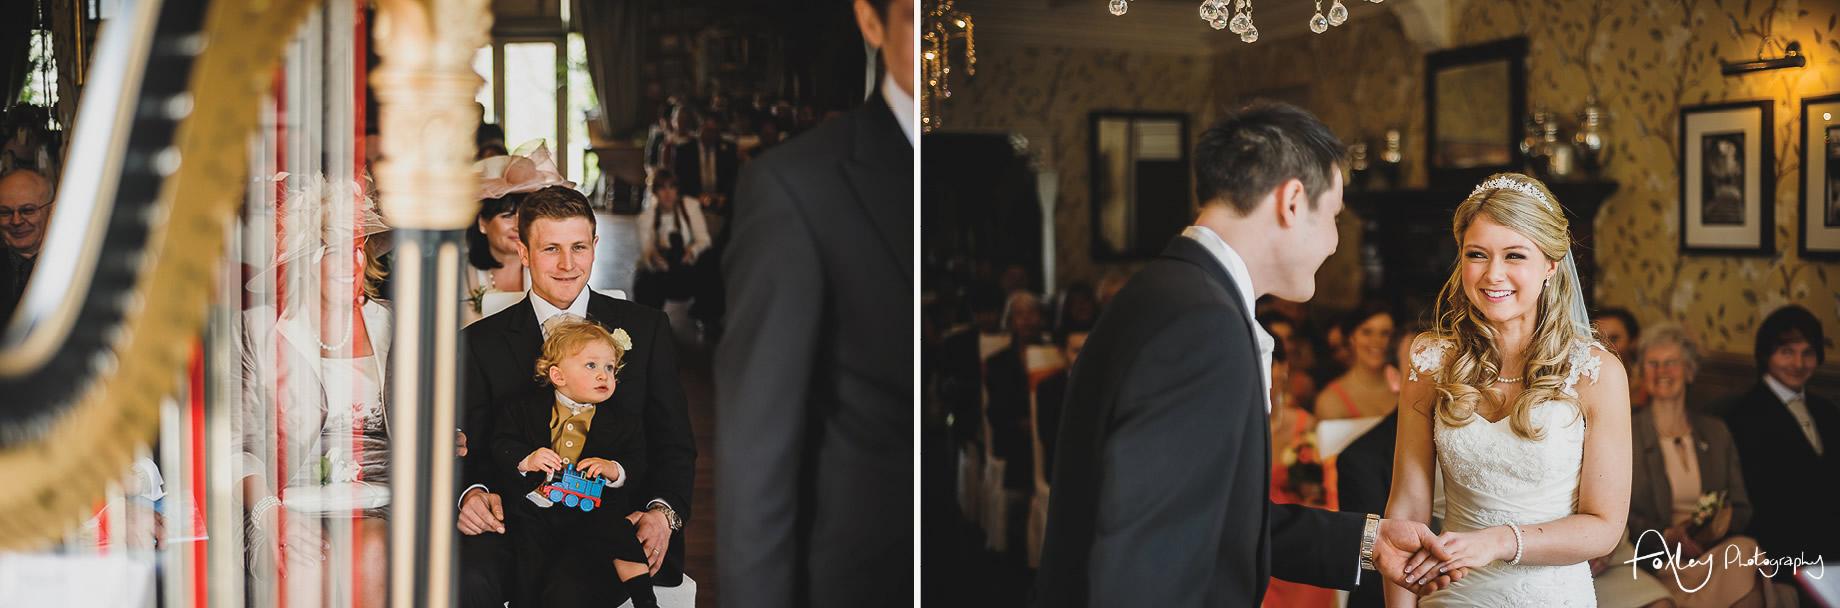 Gemma and Lewis' Wedding at Mitton Hall 075